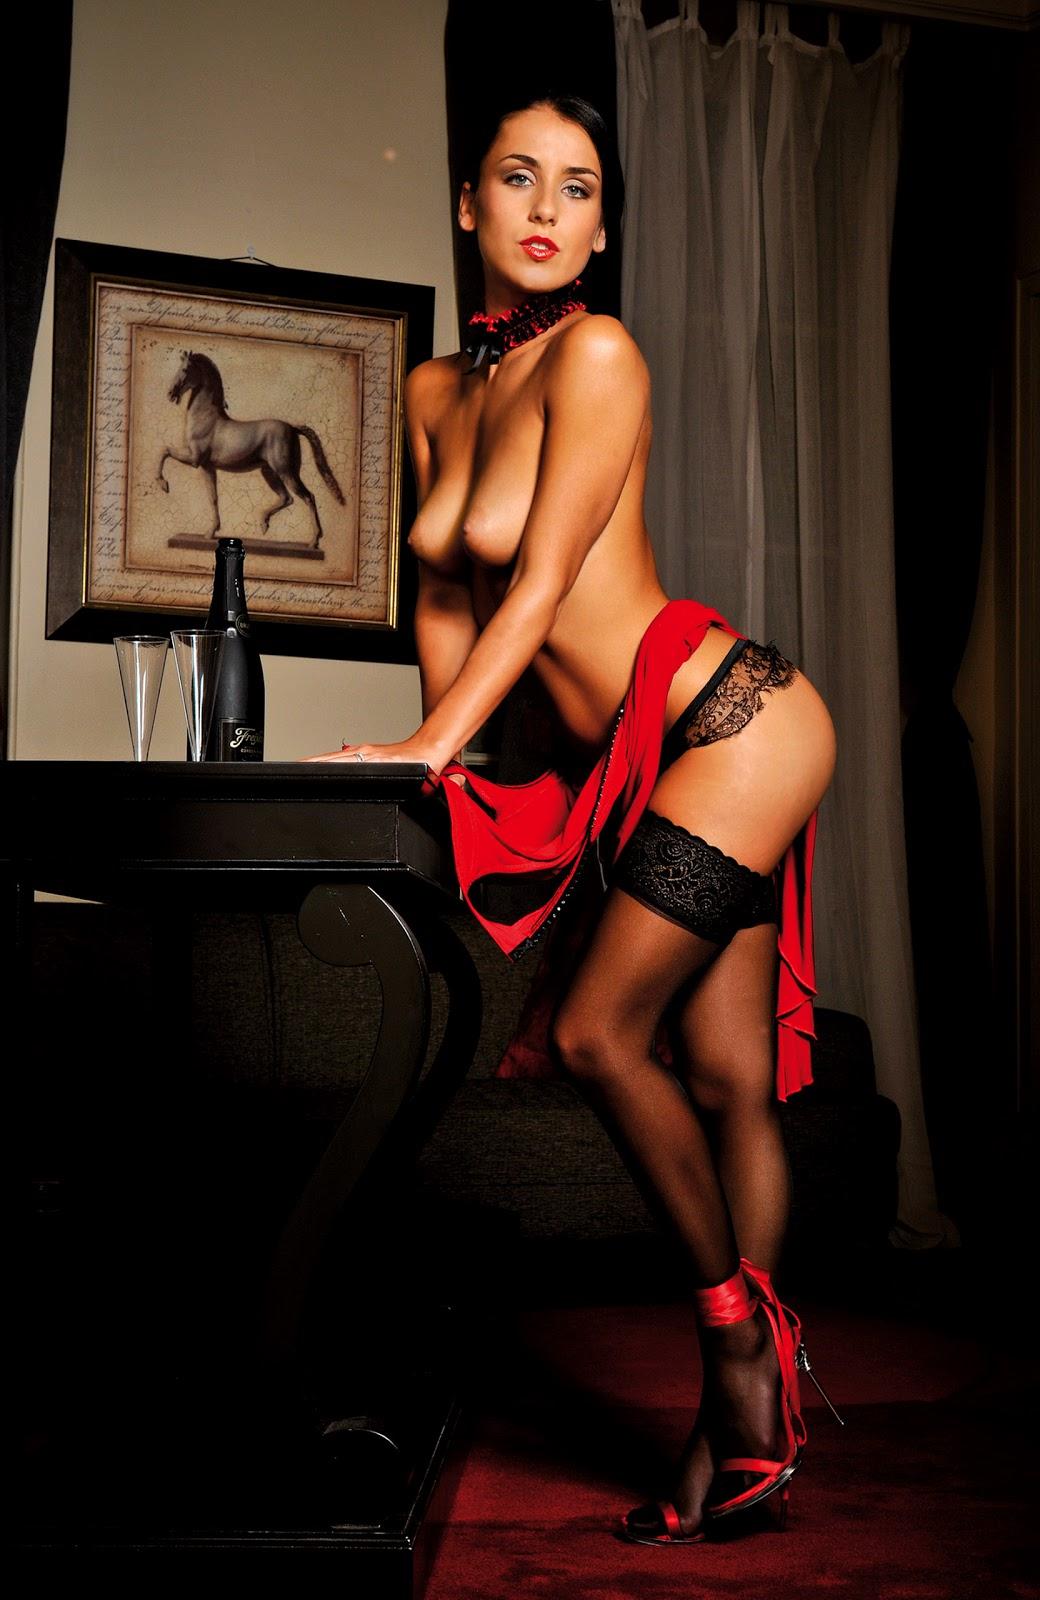 Atrises Porno Com passion porno actrices jade laroche gallery-18060 | my hotz pic